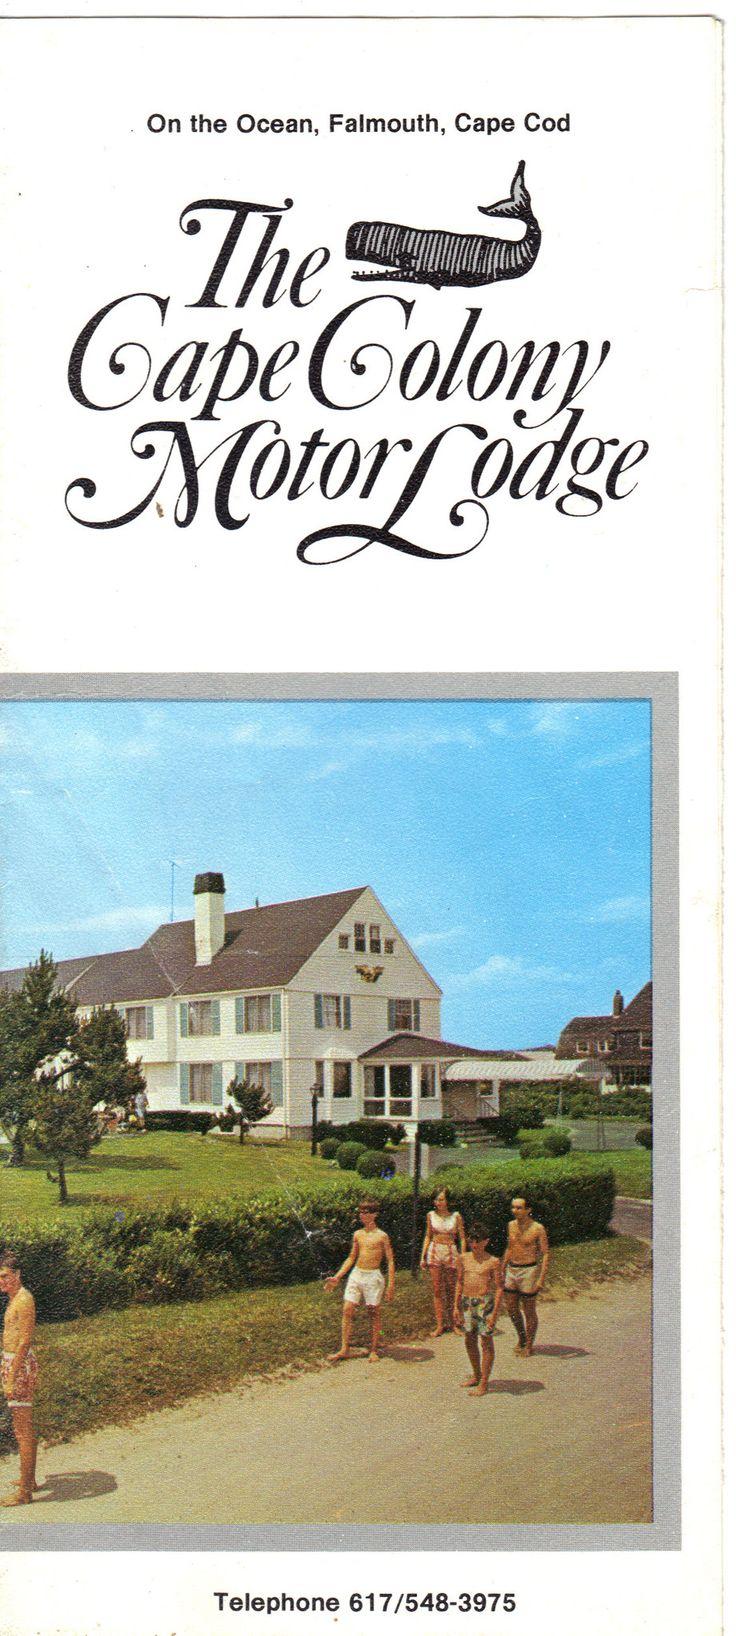 The Cape Colony Motor Lodge Brochure